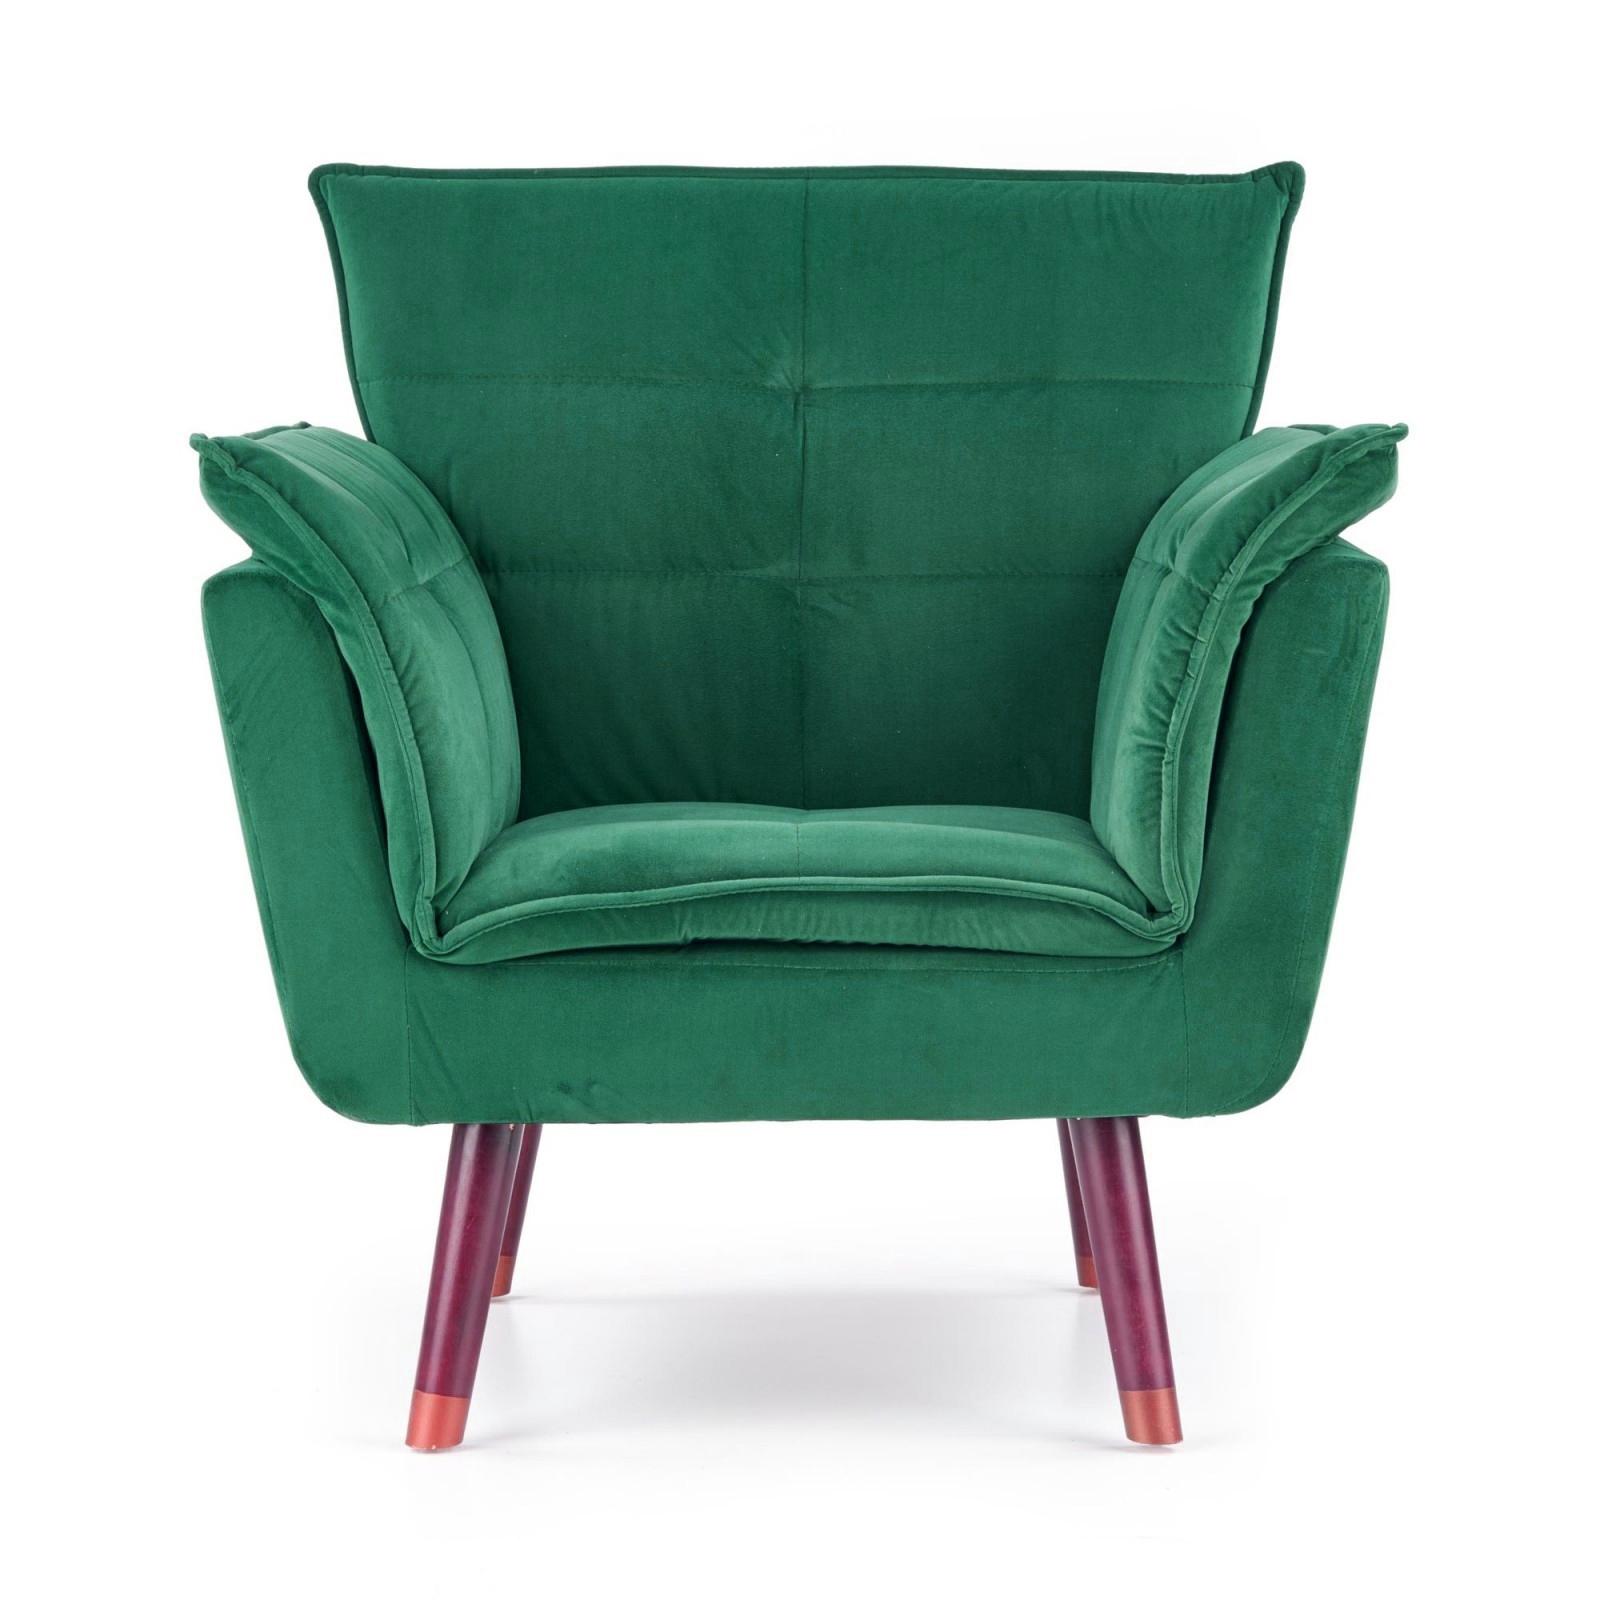 Fotoliu tapitat cu stofa, cu picioare din lemn Rezzo Dark Green, l80xA73xH84 cm poza